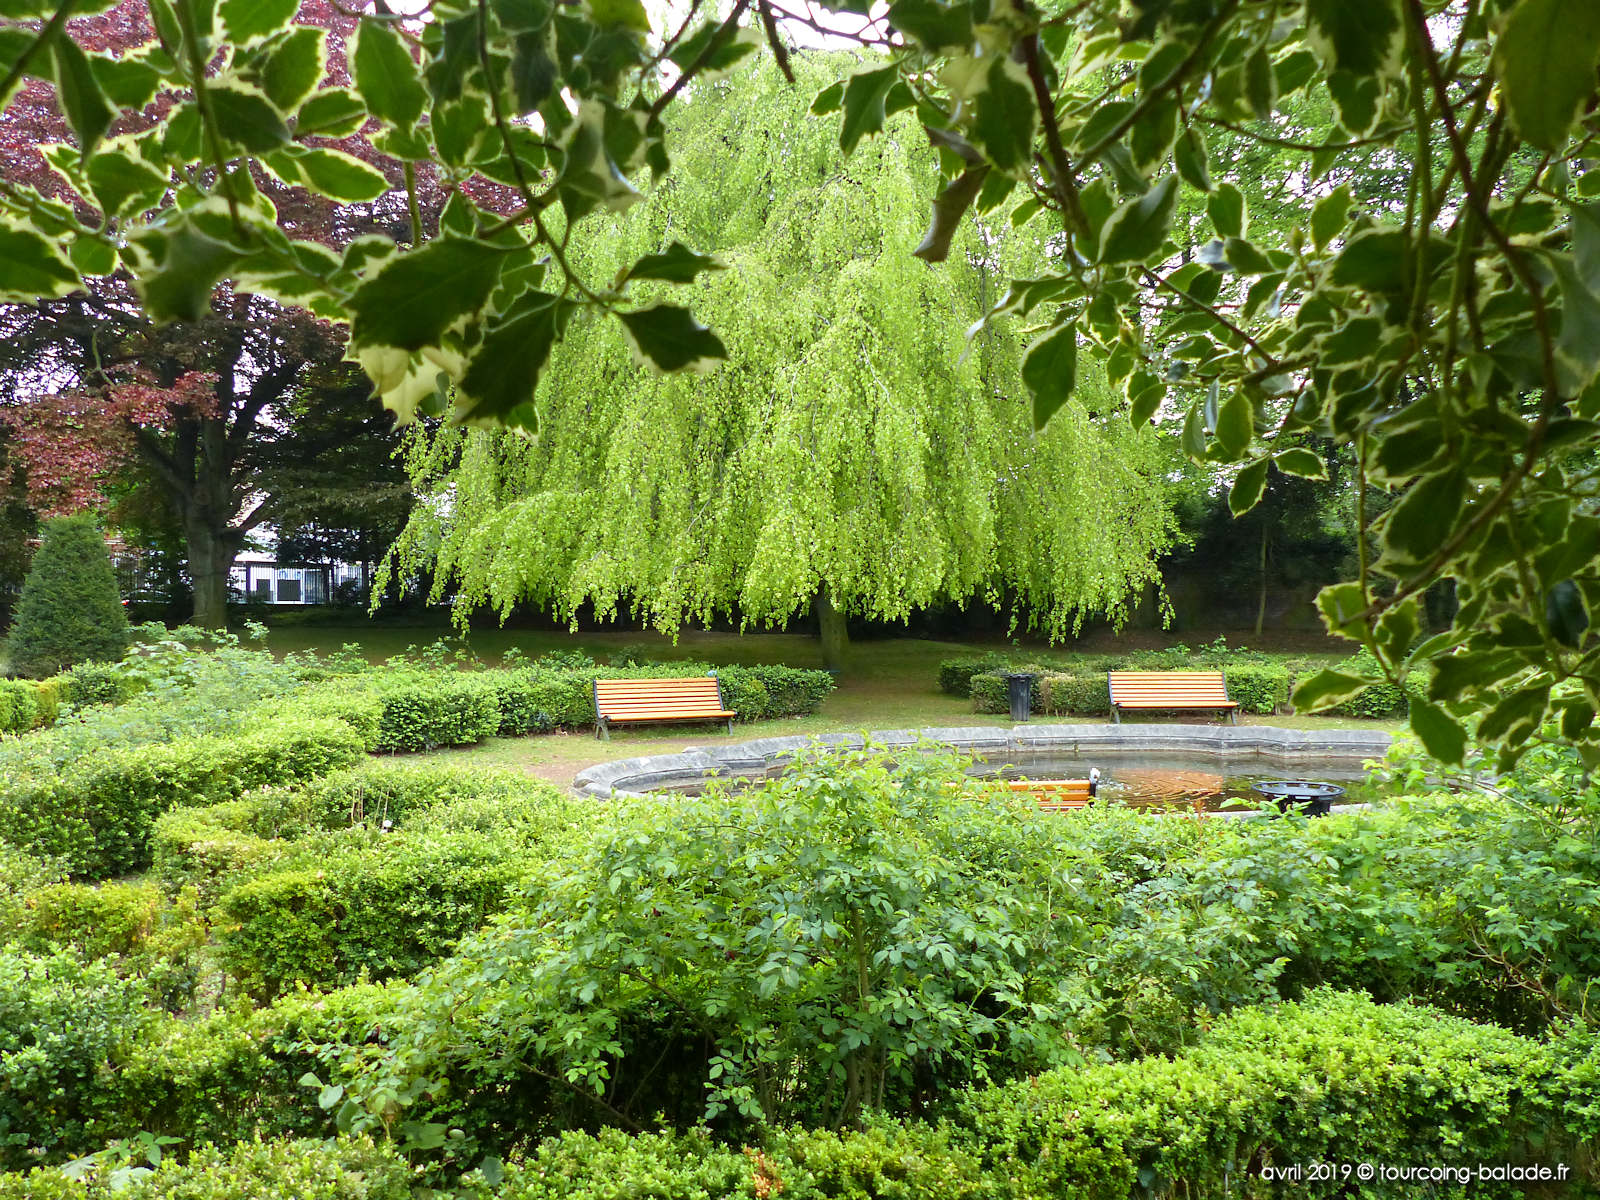 Parcs et Jardins Tourcoing - Jardin public Gambetta, 2019.